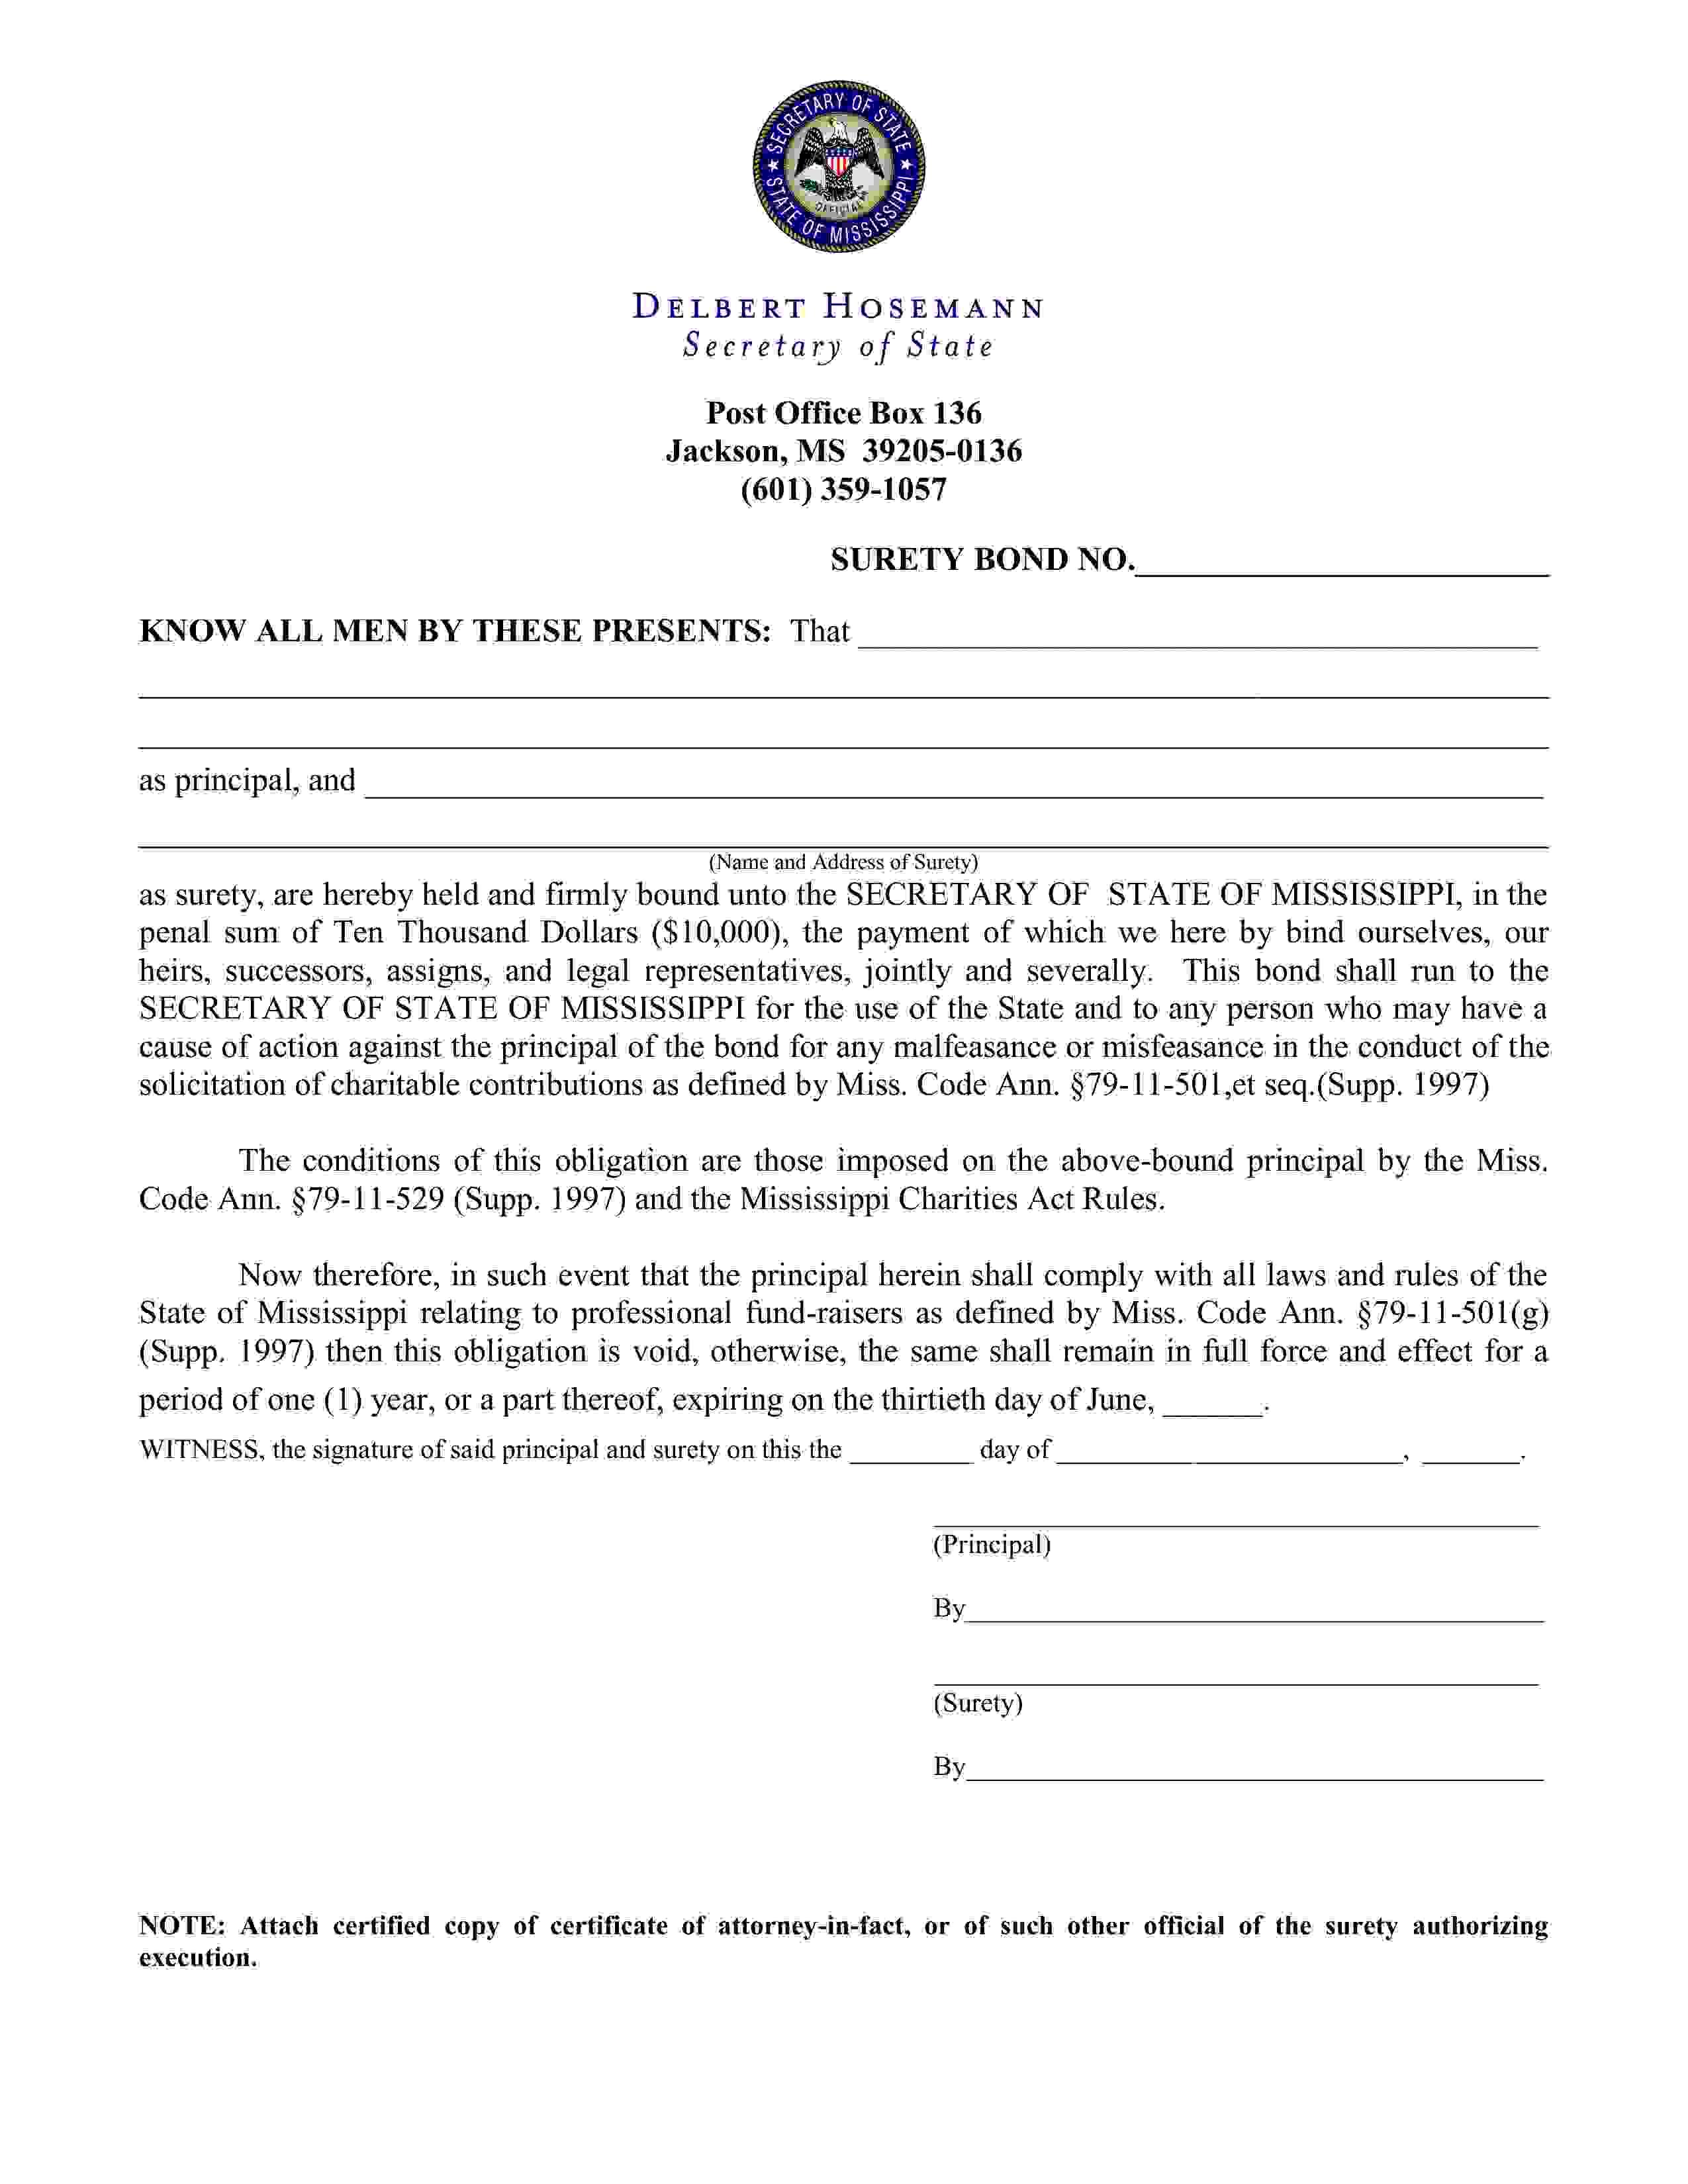 State of Mississippi Professional Fundraiser Bond sample image